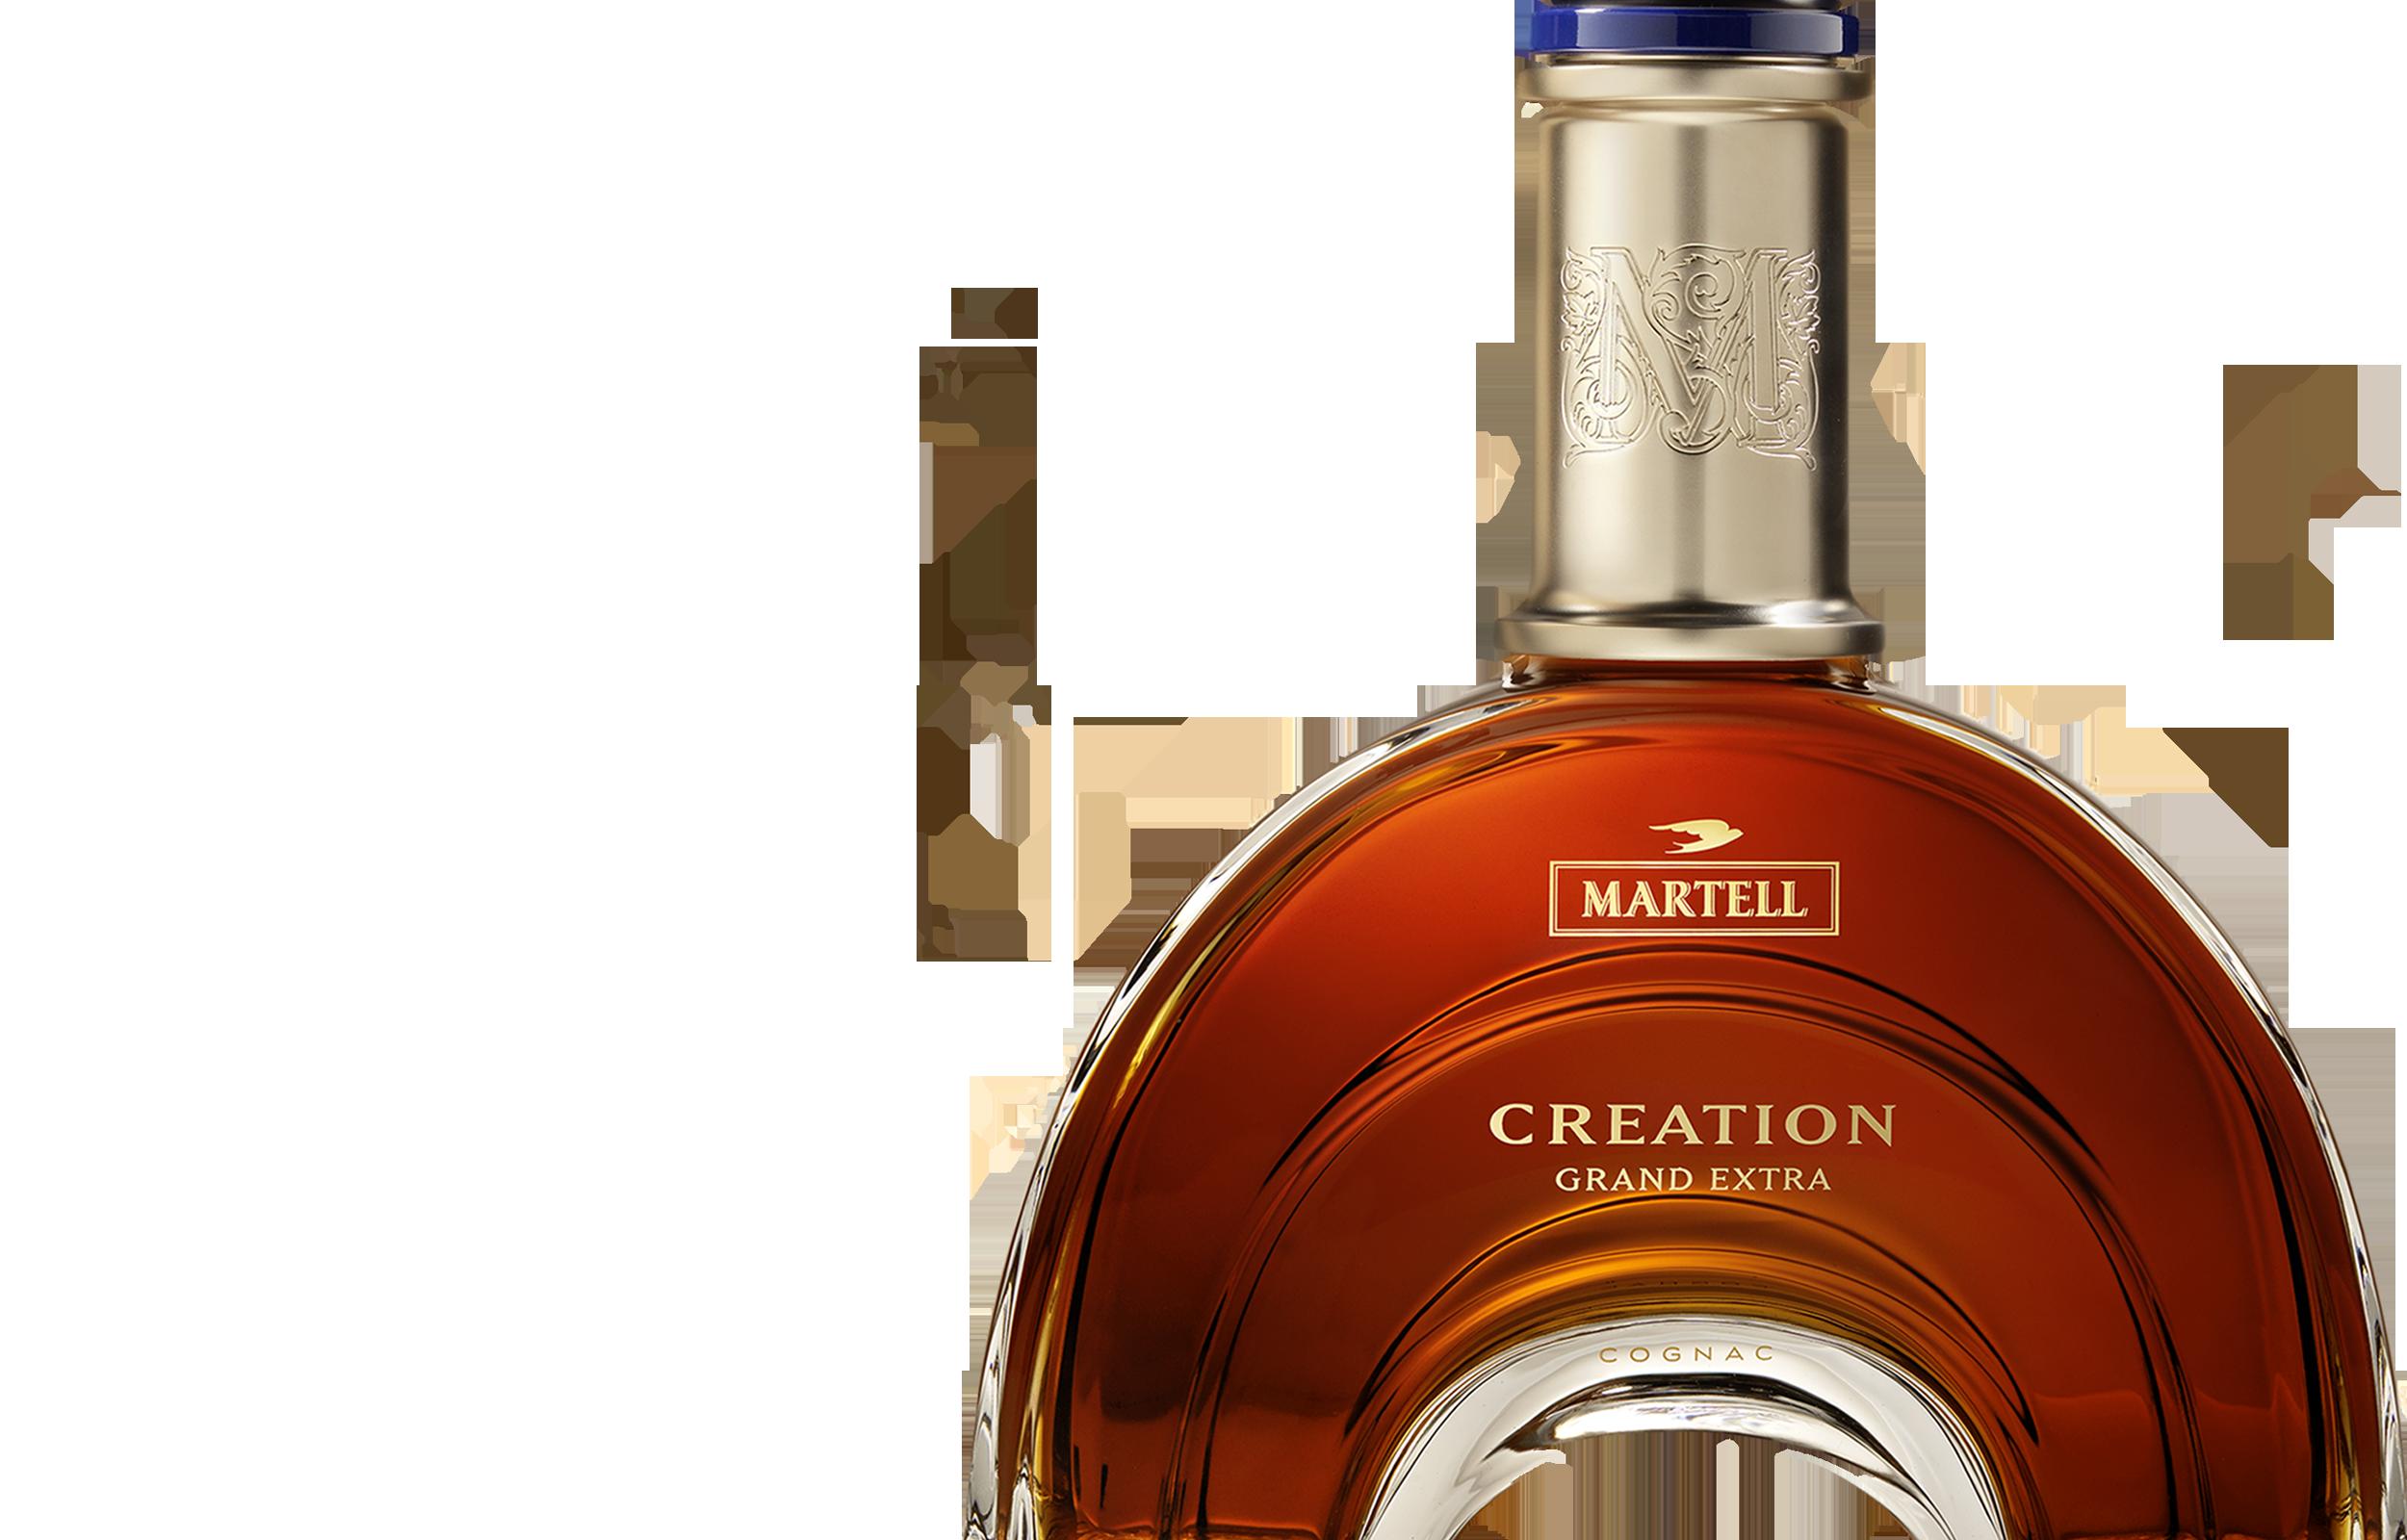 Martell Cognac Grand Extra Bottle